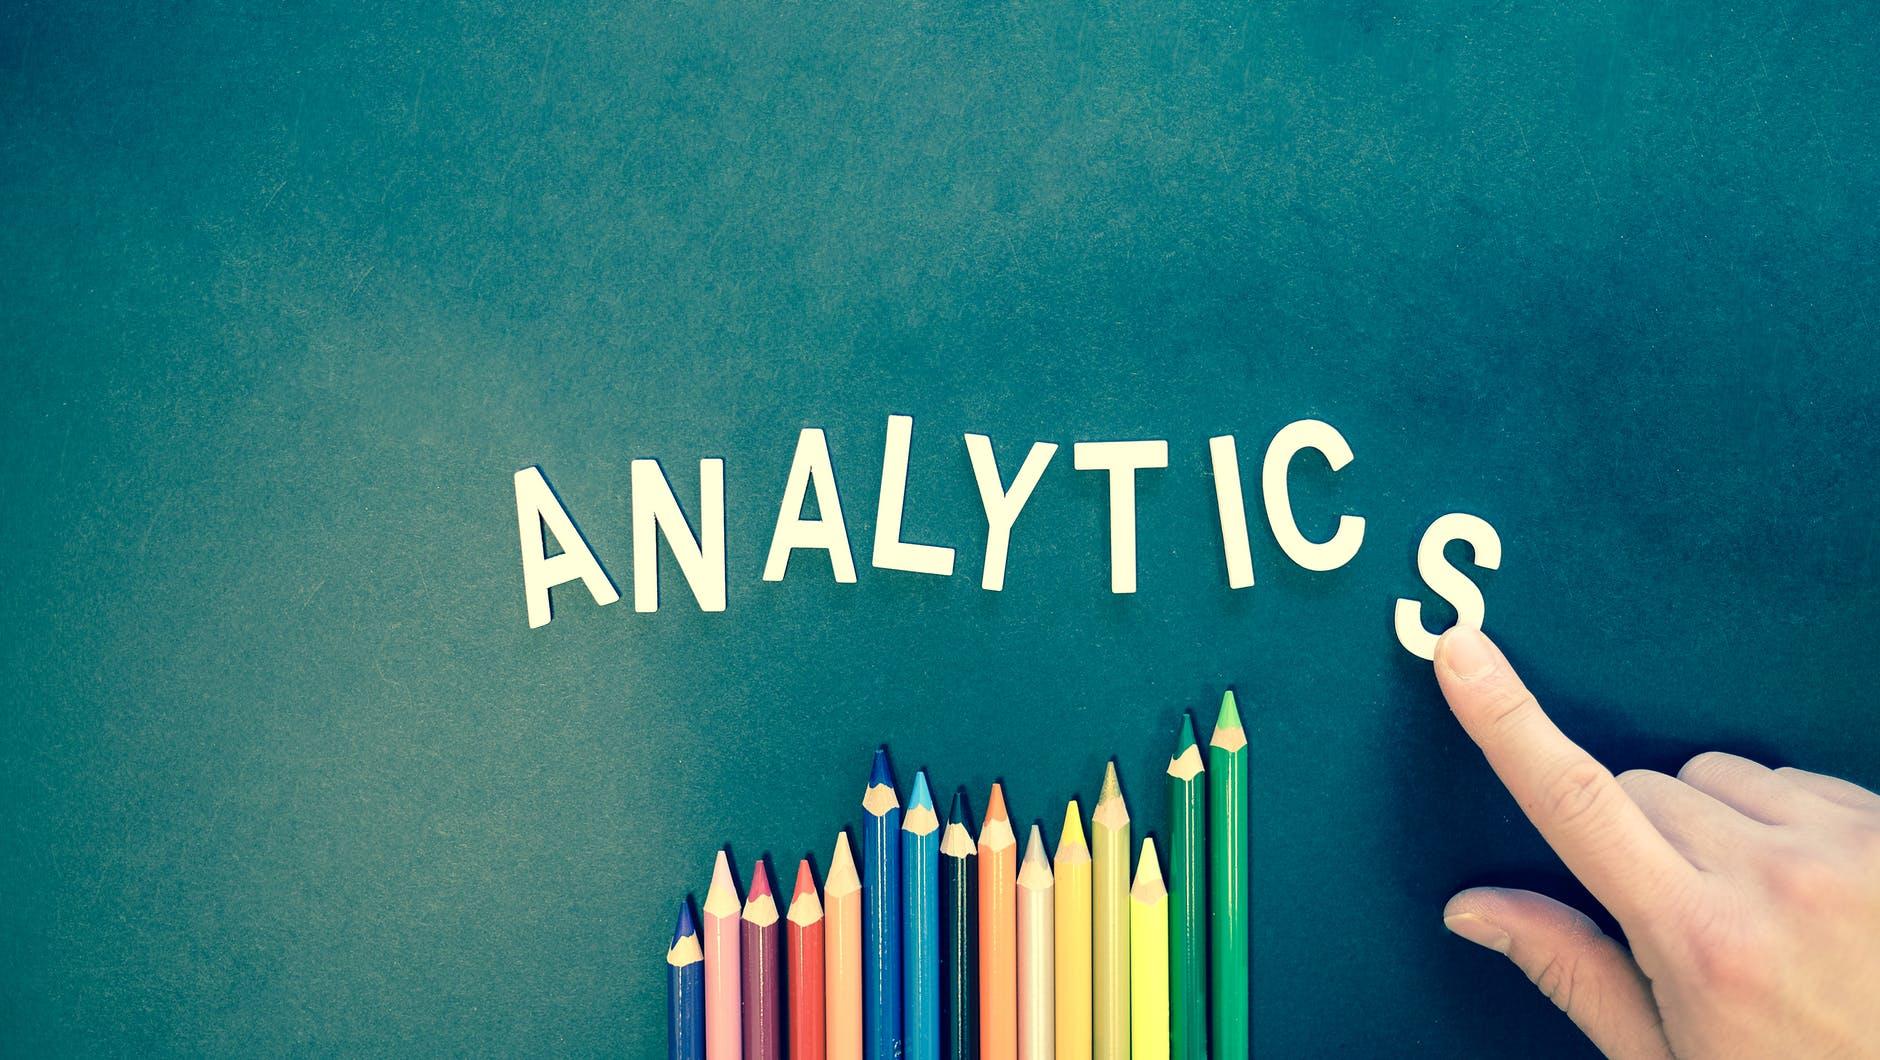 analytics text